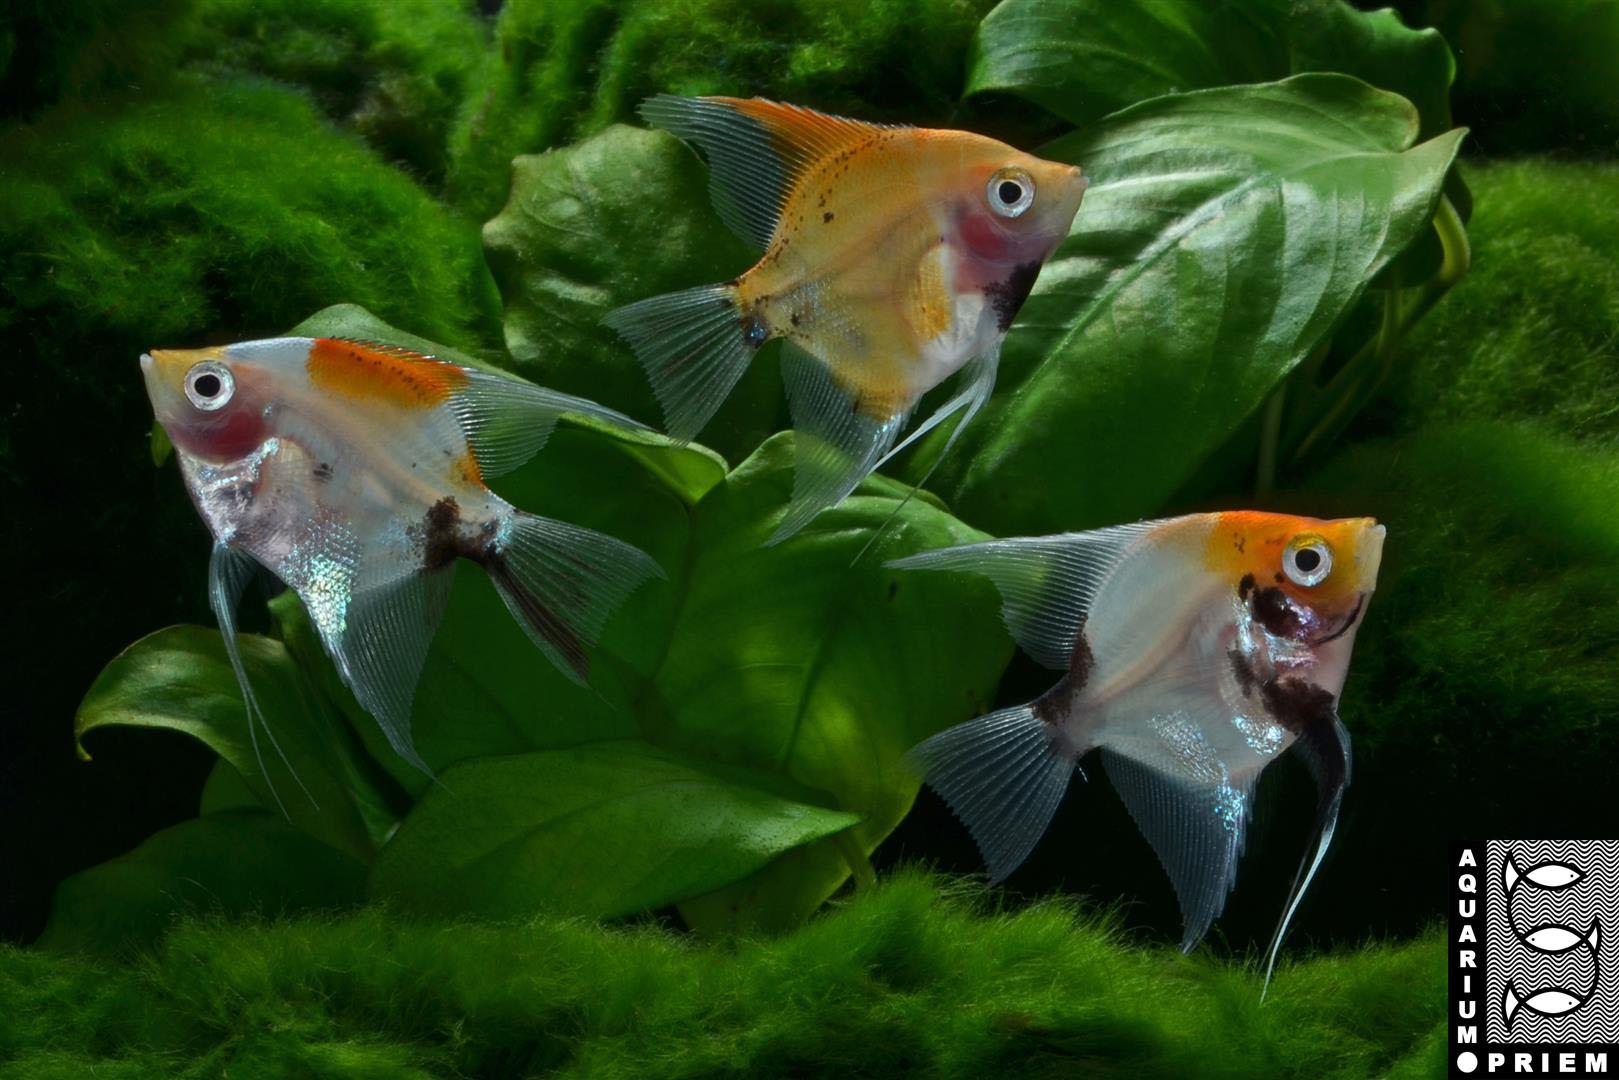 Skalar-Koi- Pterophyllum-scalare-G-Priem